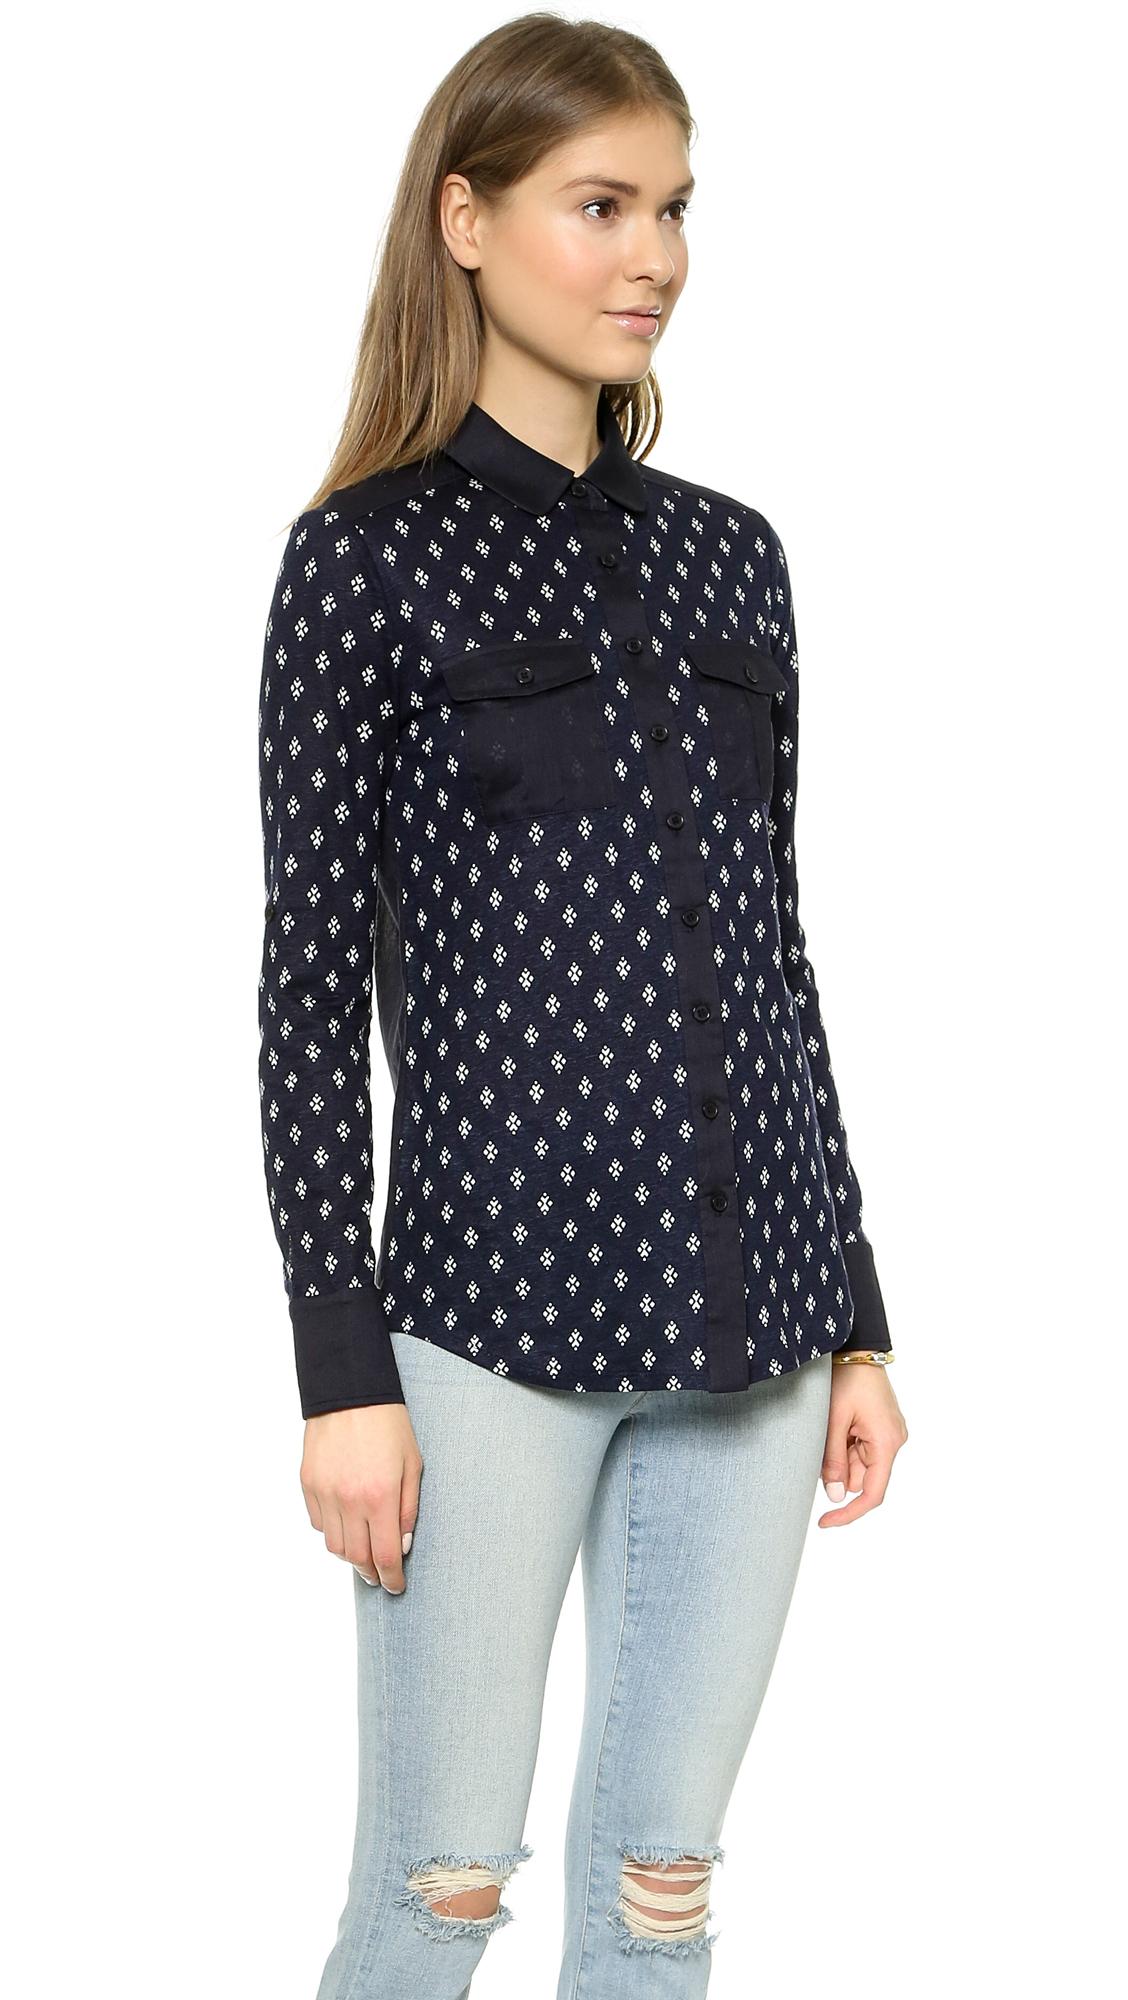 tory burch finlay button down shirt tory navy diamond in